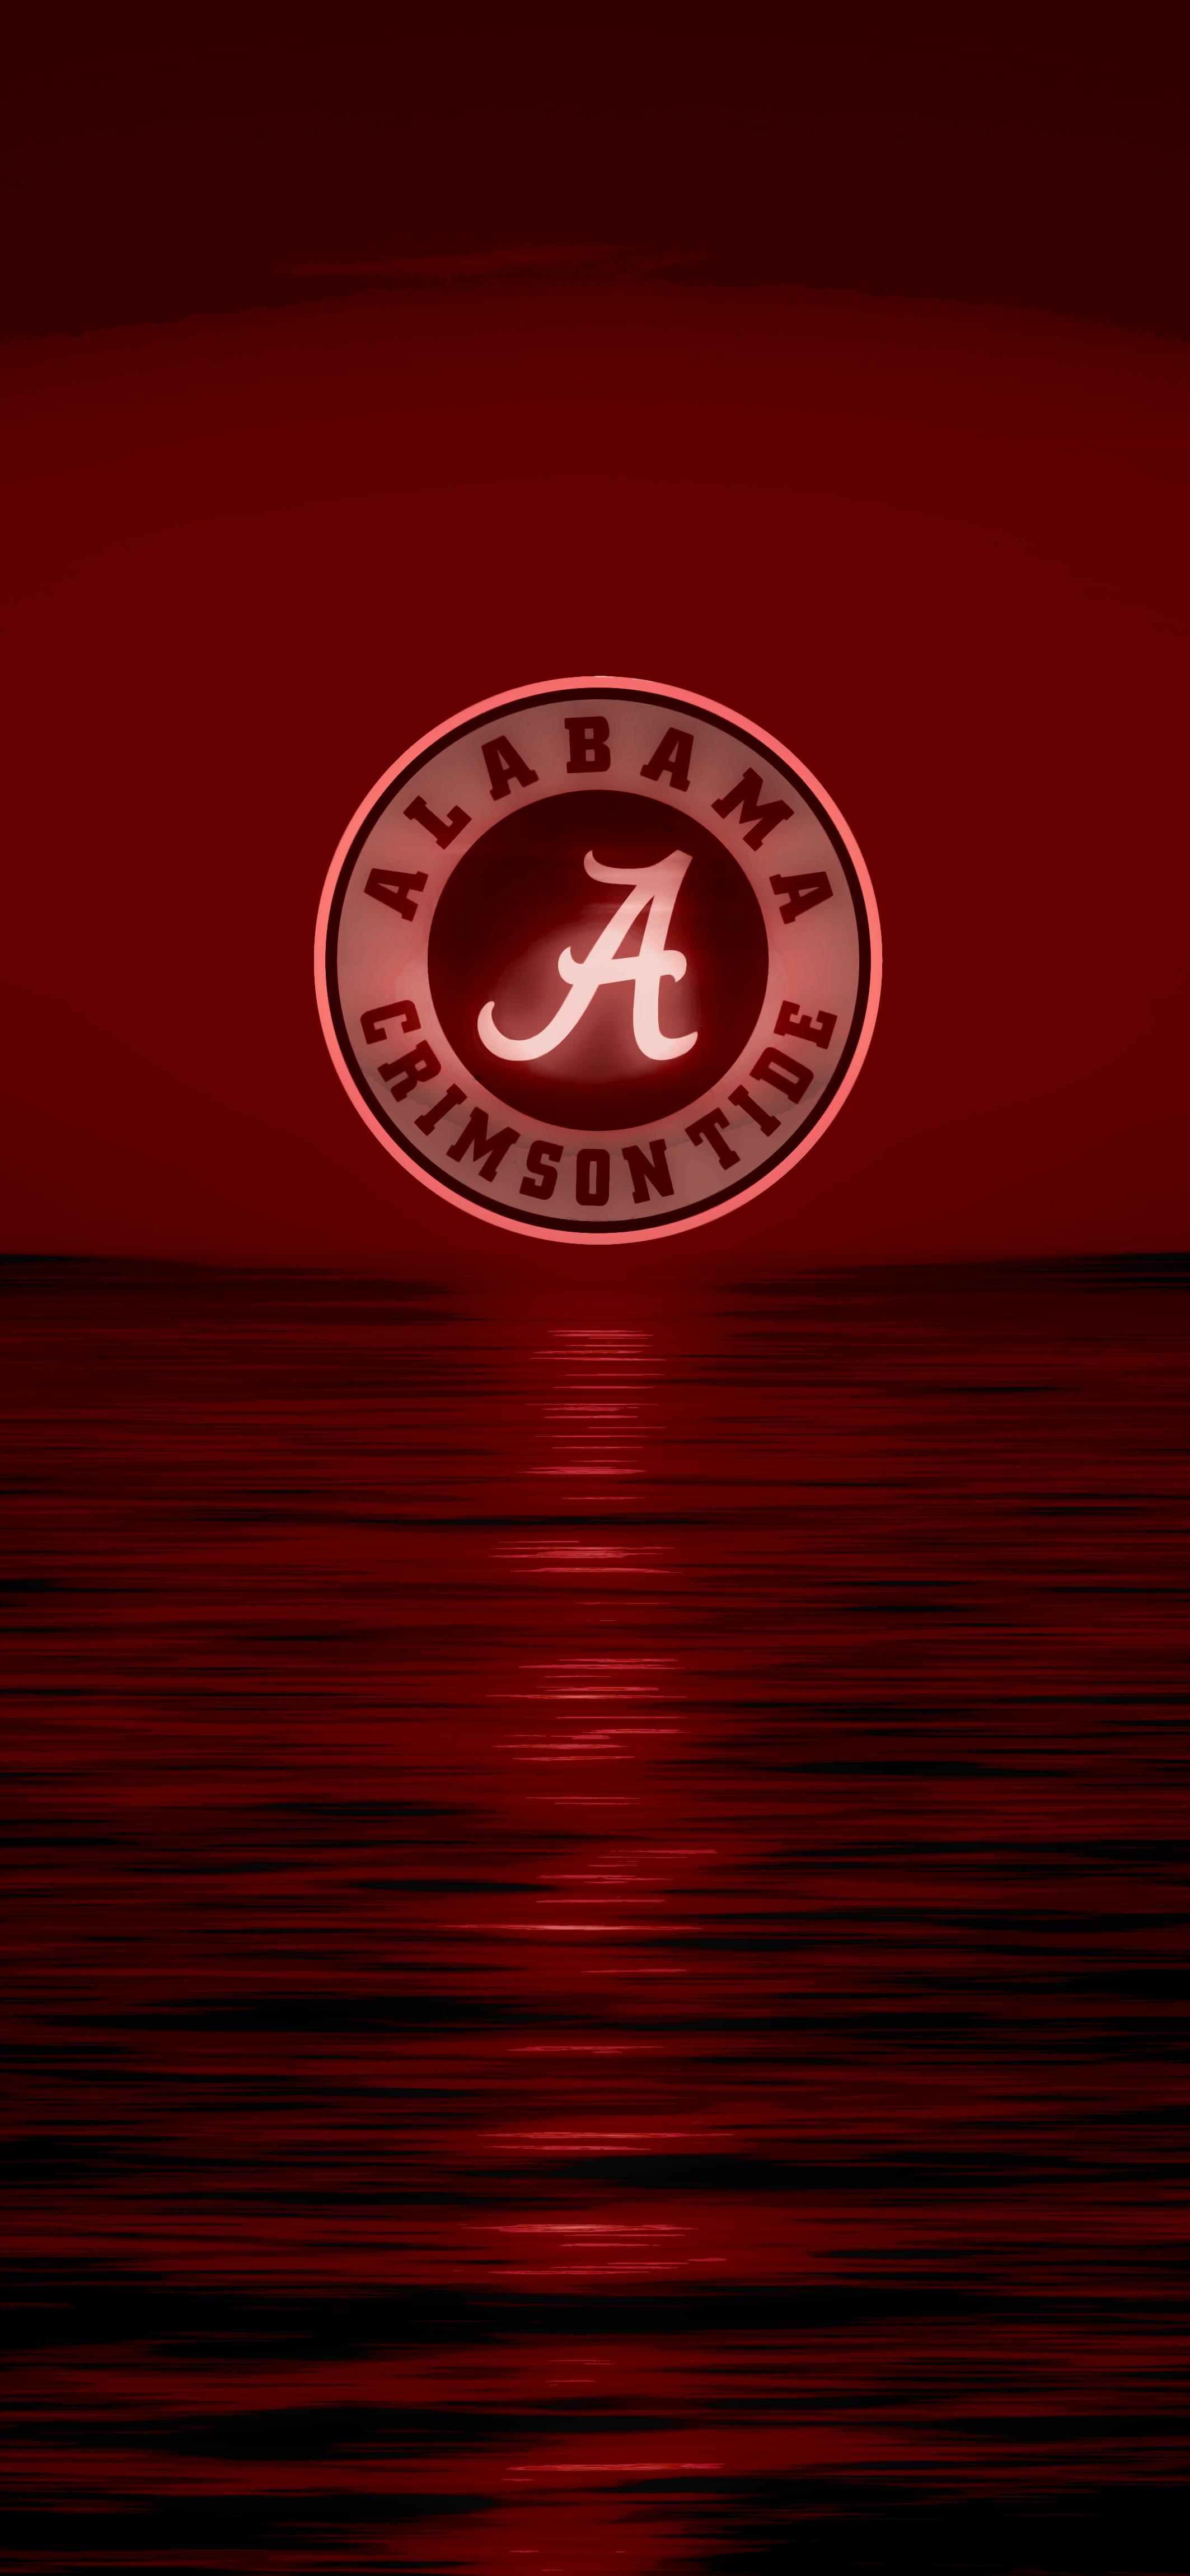 Alabama Crimson Tide Football Wallpapers Wallpaper Cave